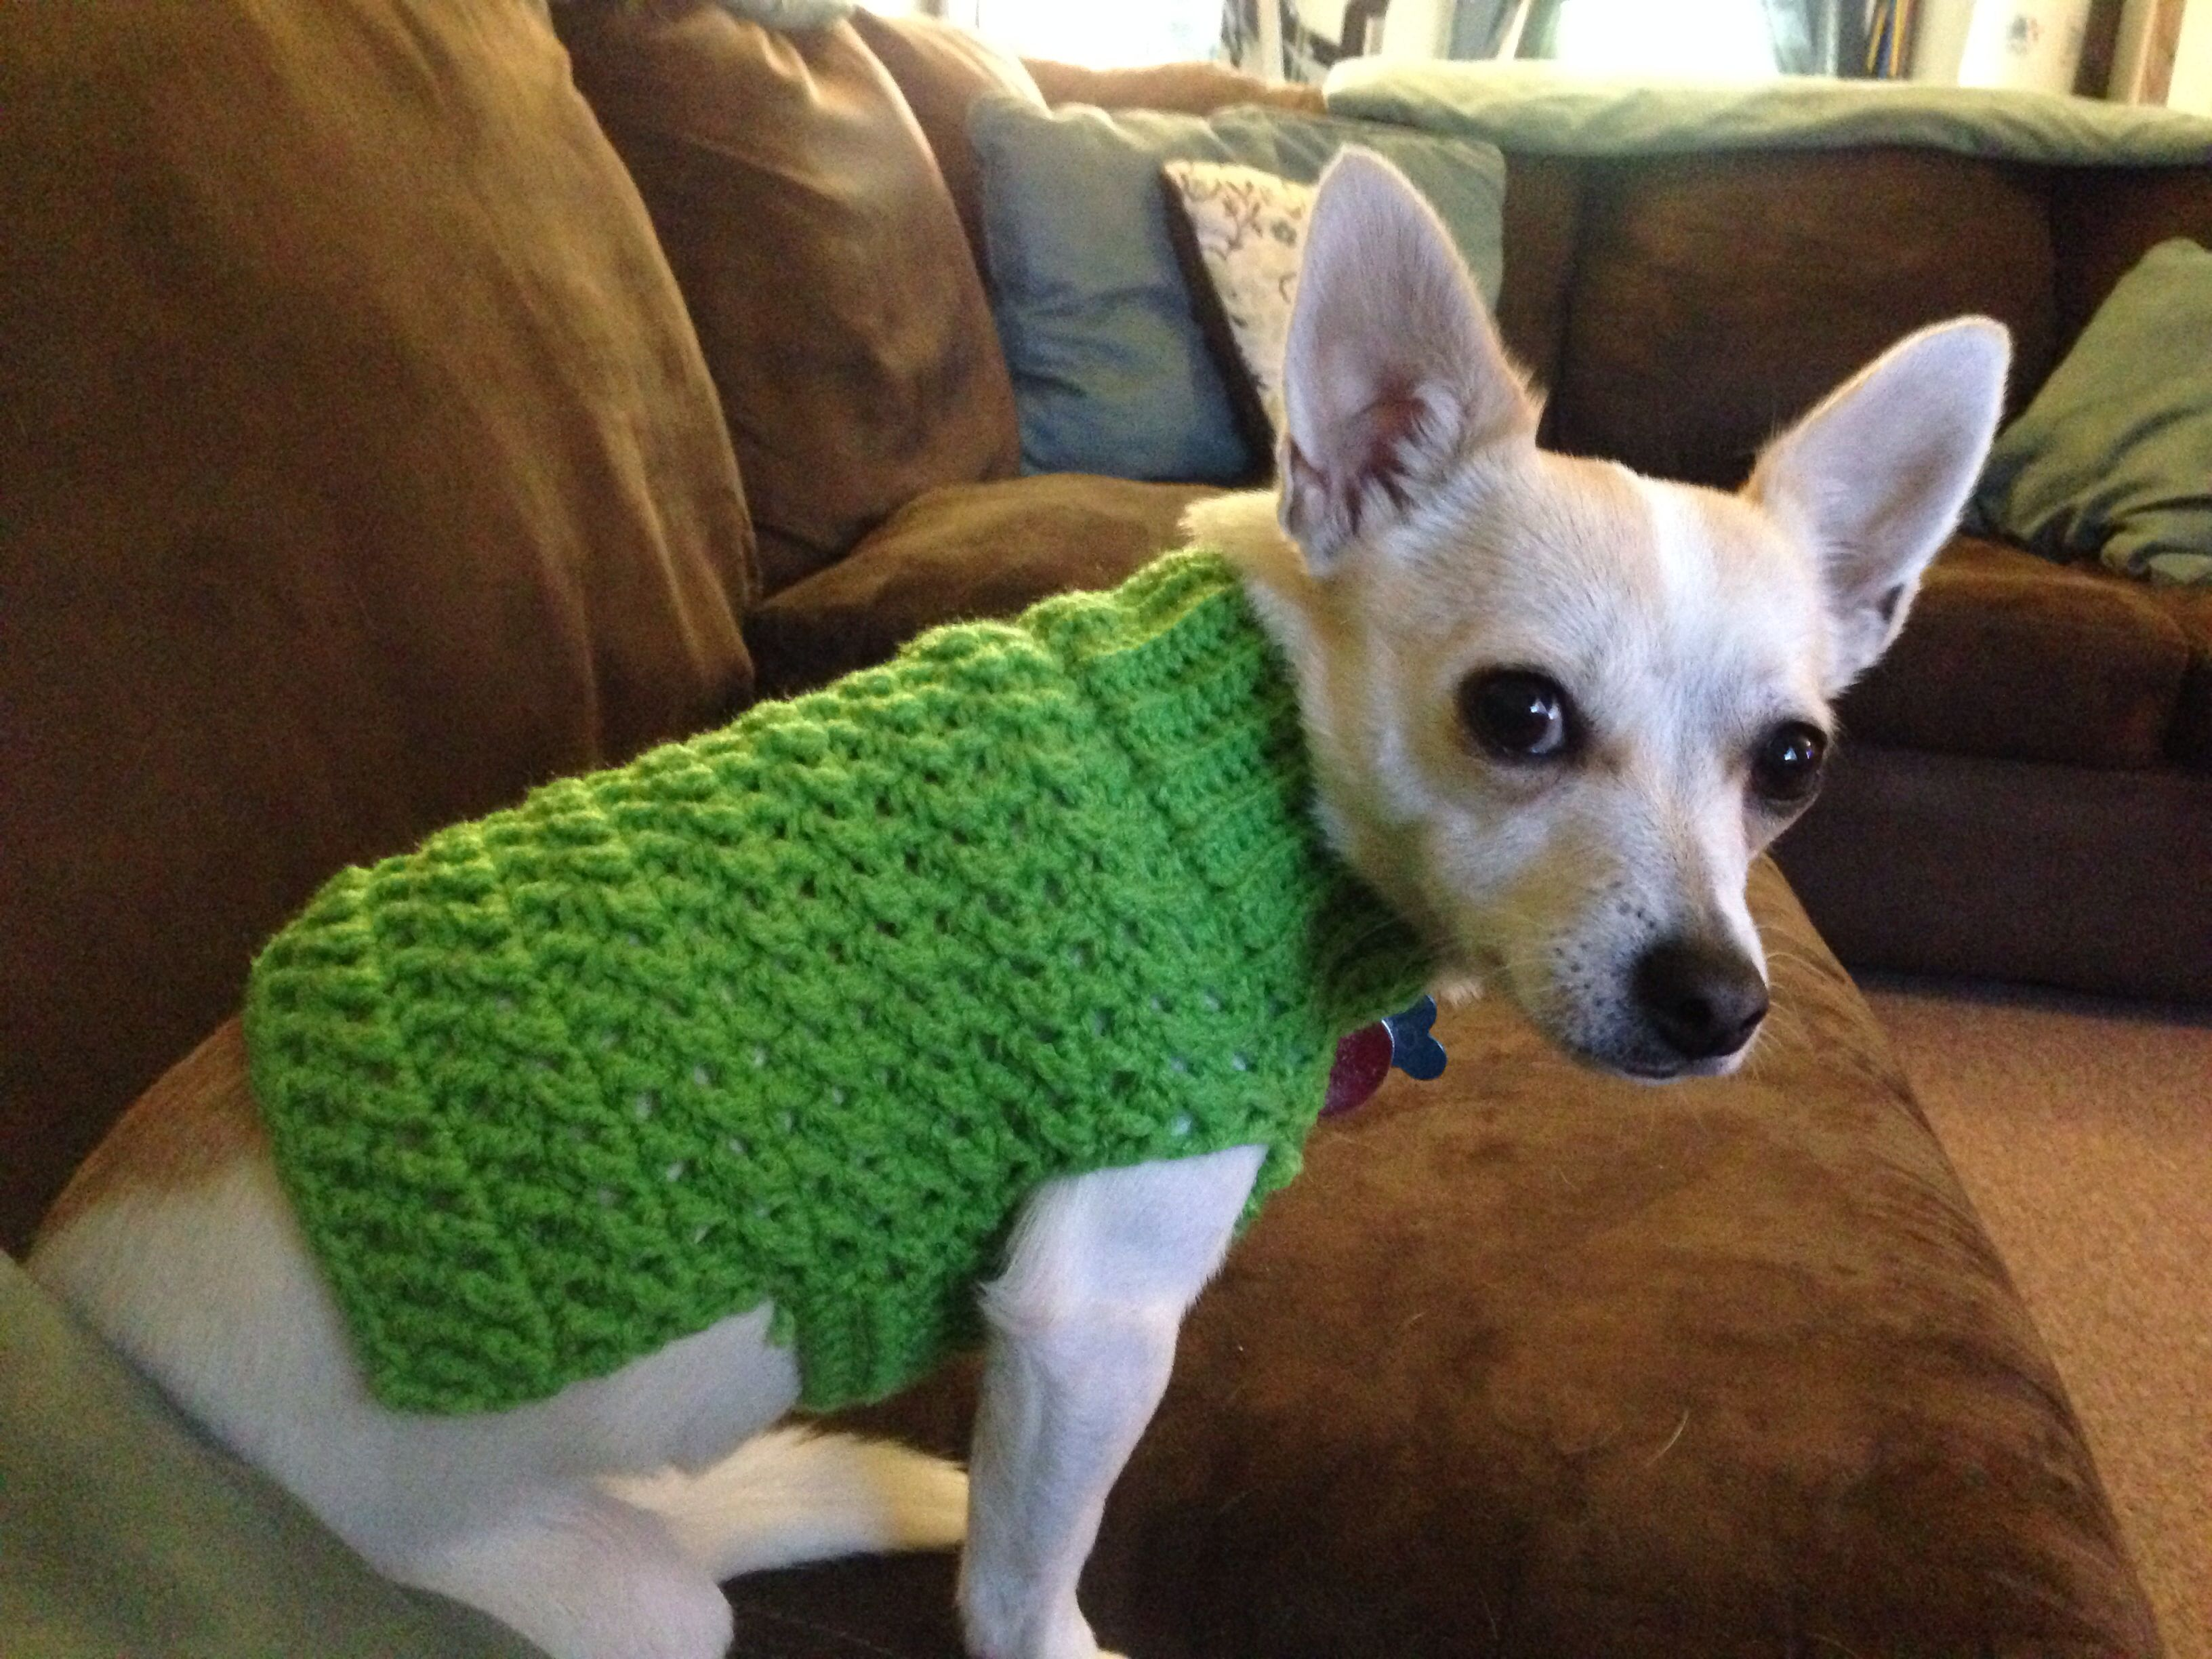 Small dog crochet sweater   DIY for Pets   Pinterest ...